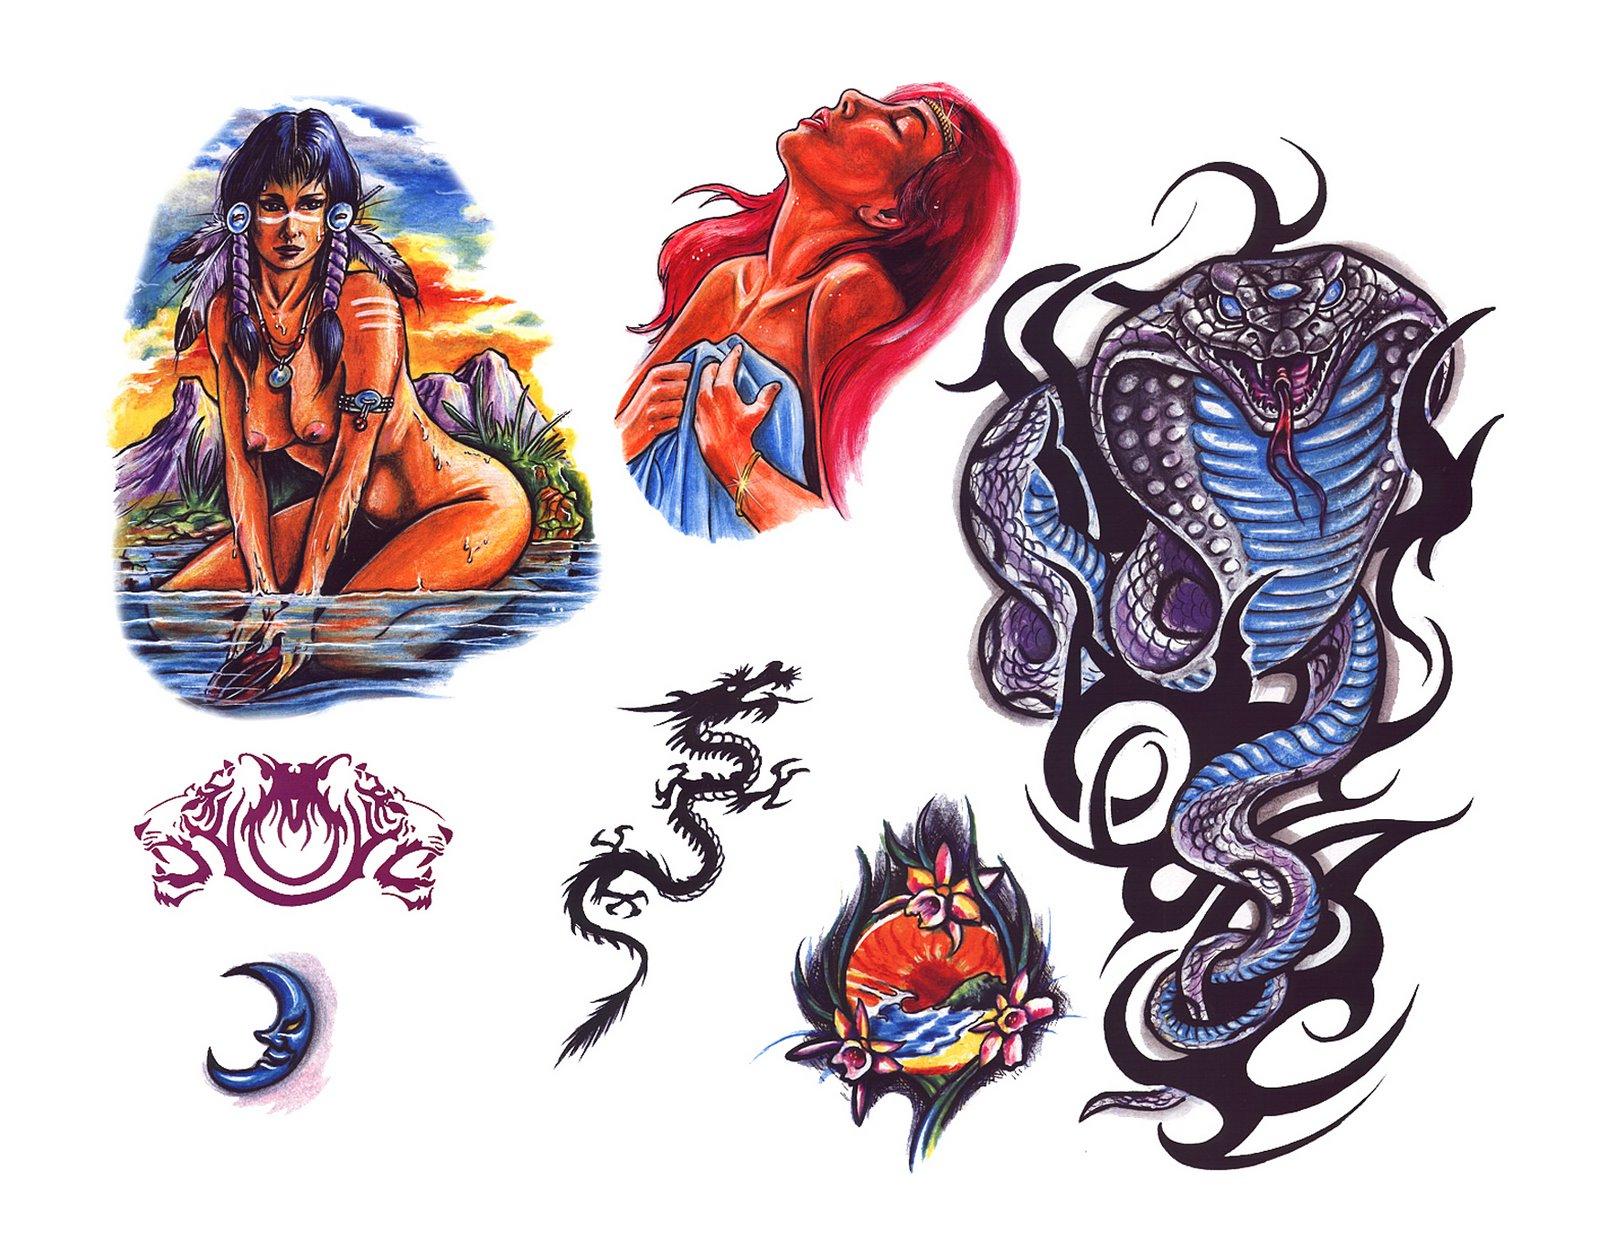 Tatttoo trend 25 glamorous tattooed guys for Tattoo shop name generator